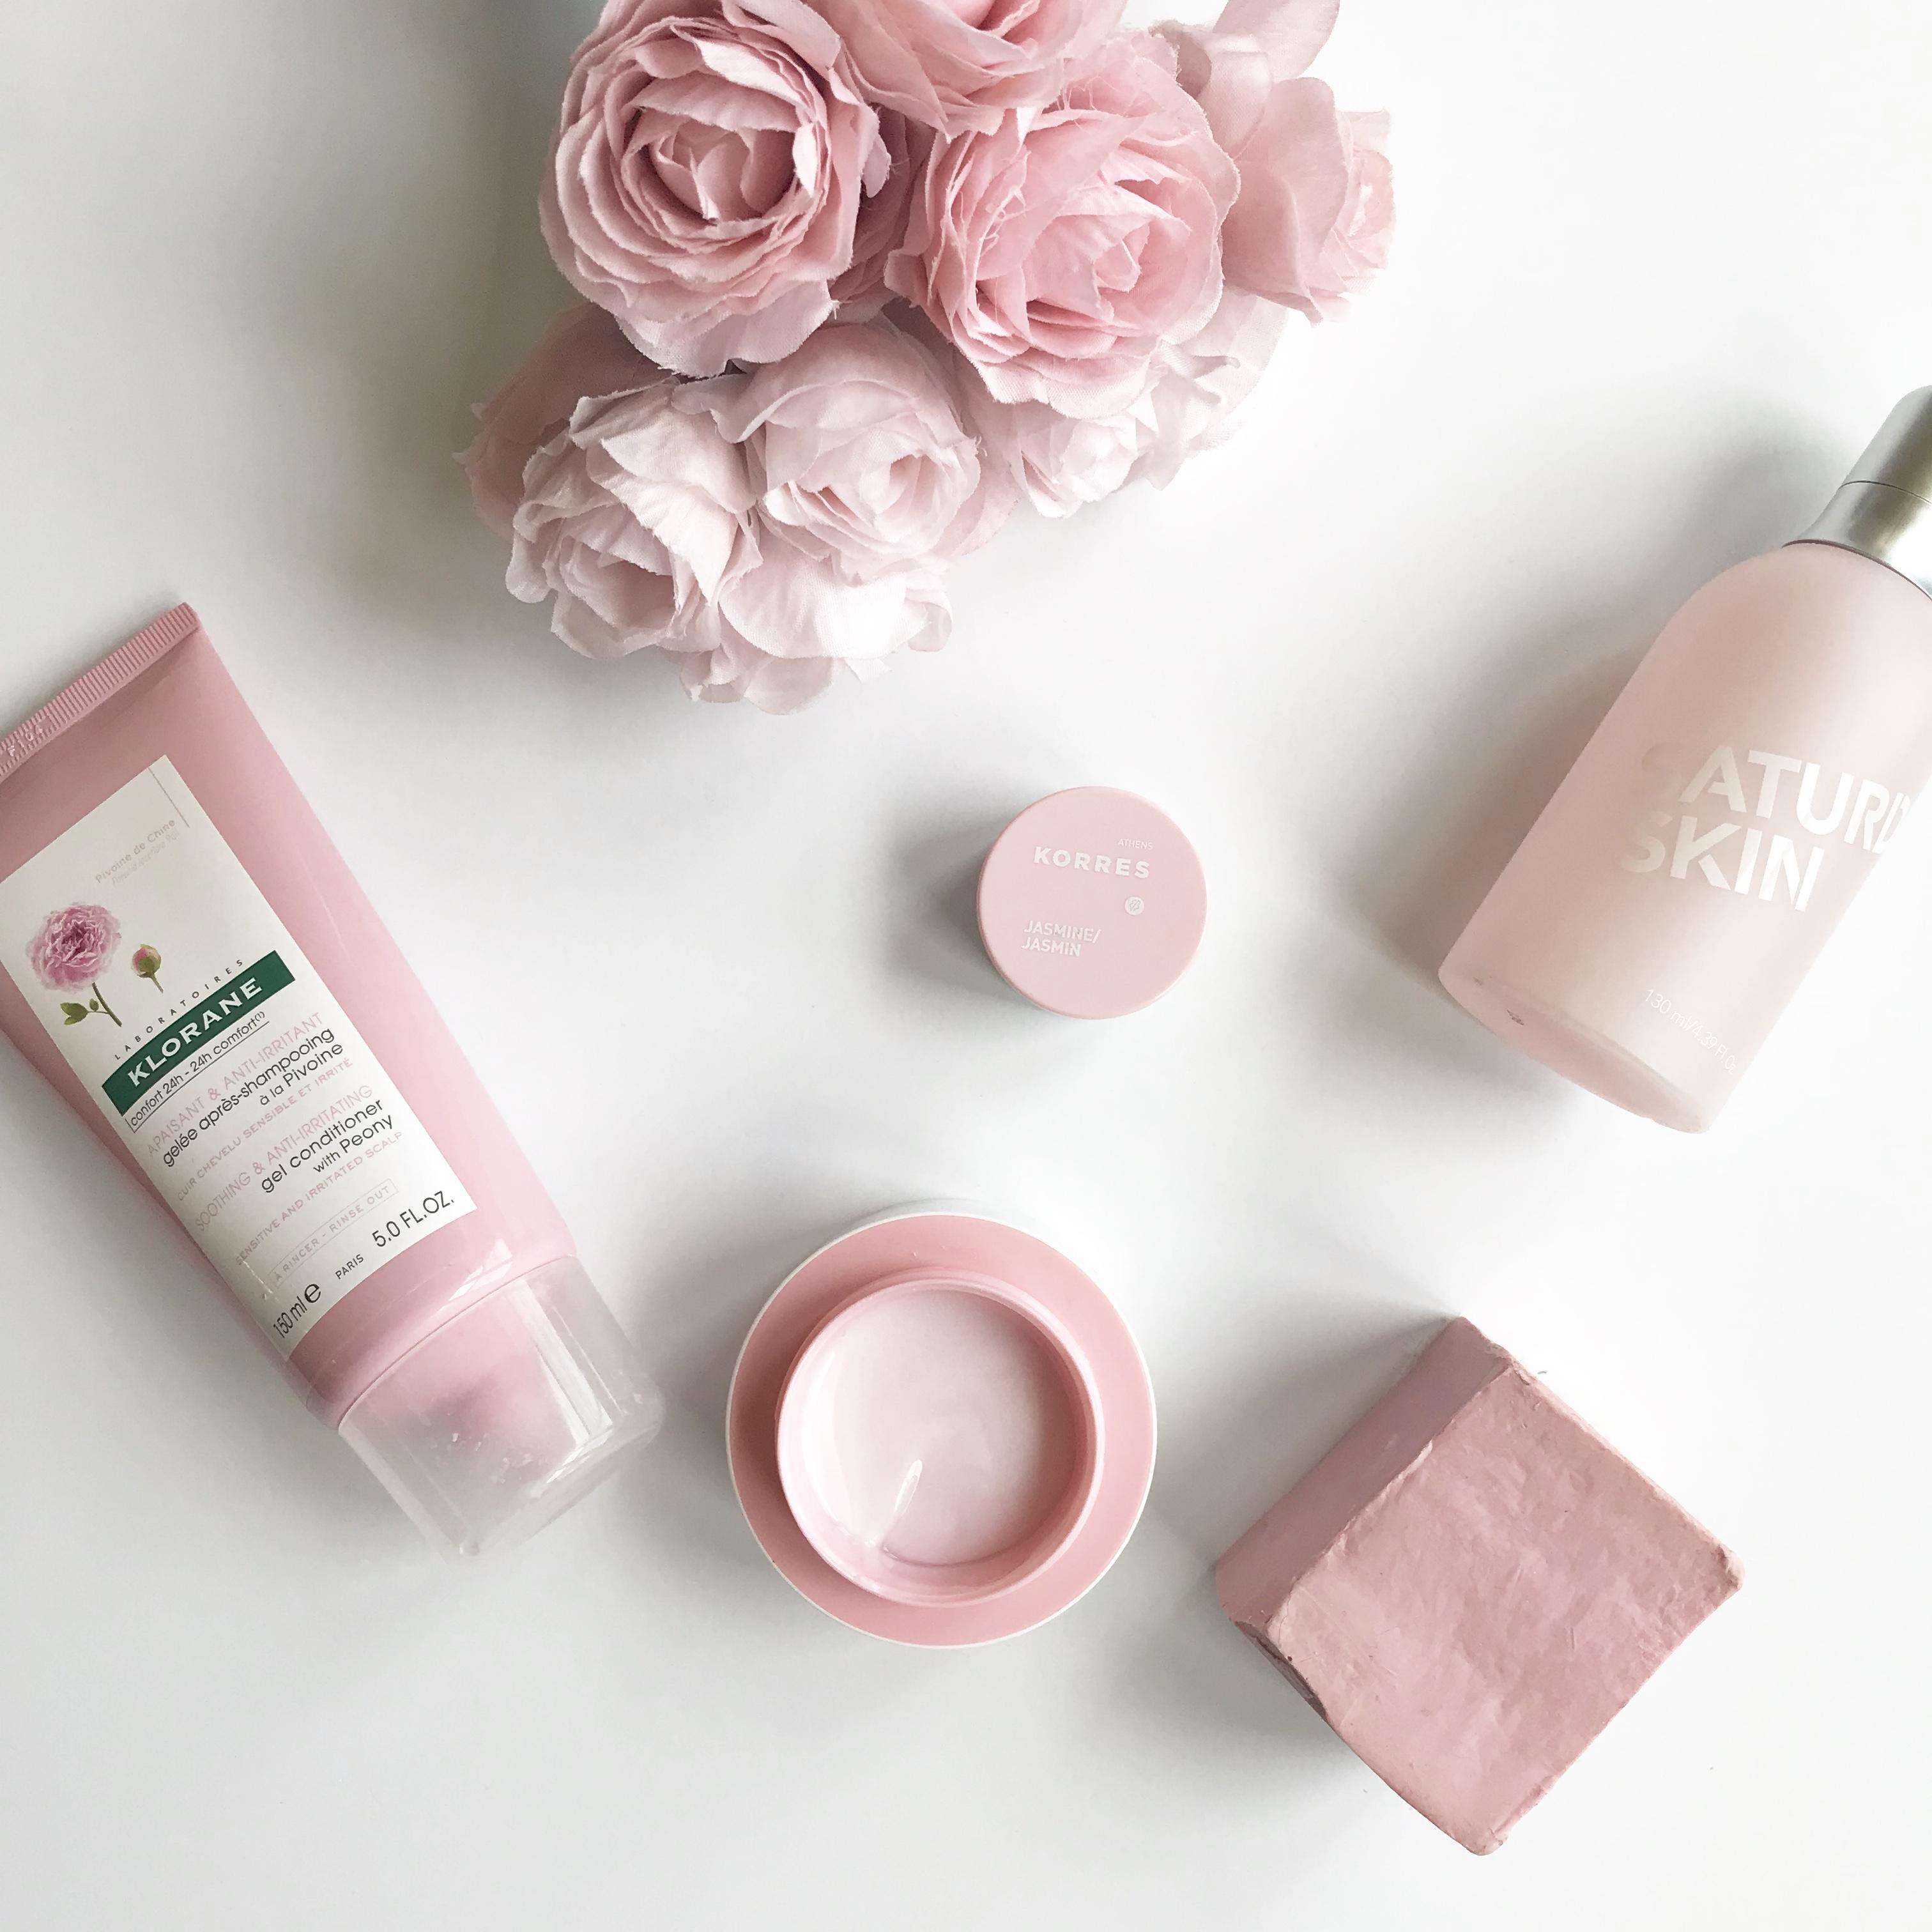 skincare jargon, skincare terms, natural skincare, organic skincare, beauty flat lay, flat lay, mens skincare, anti aging skincare, natural cosmetics, organic cosmetics,